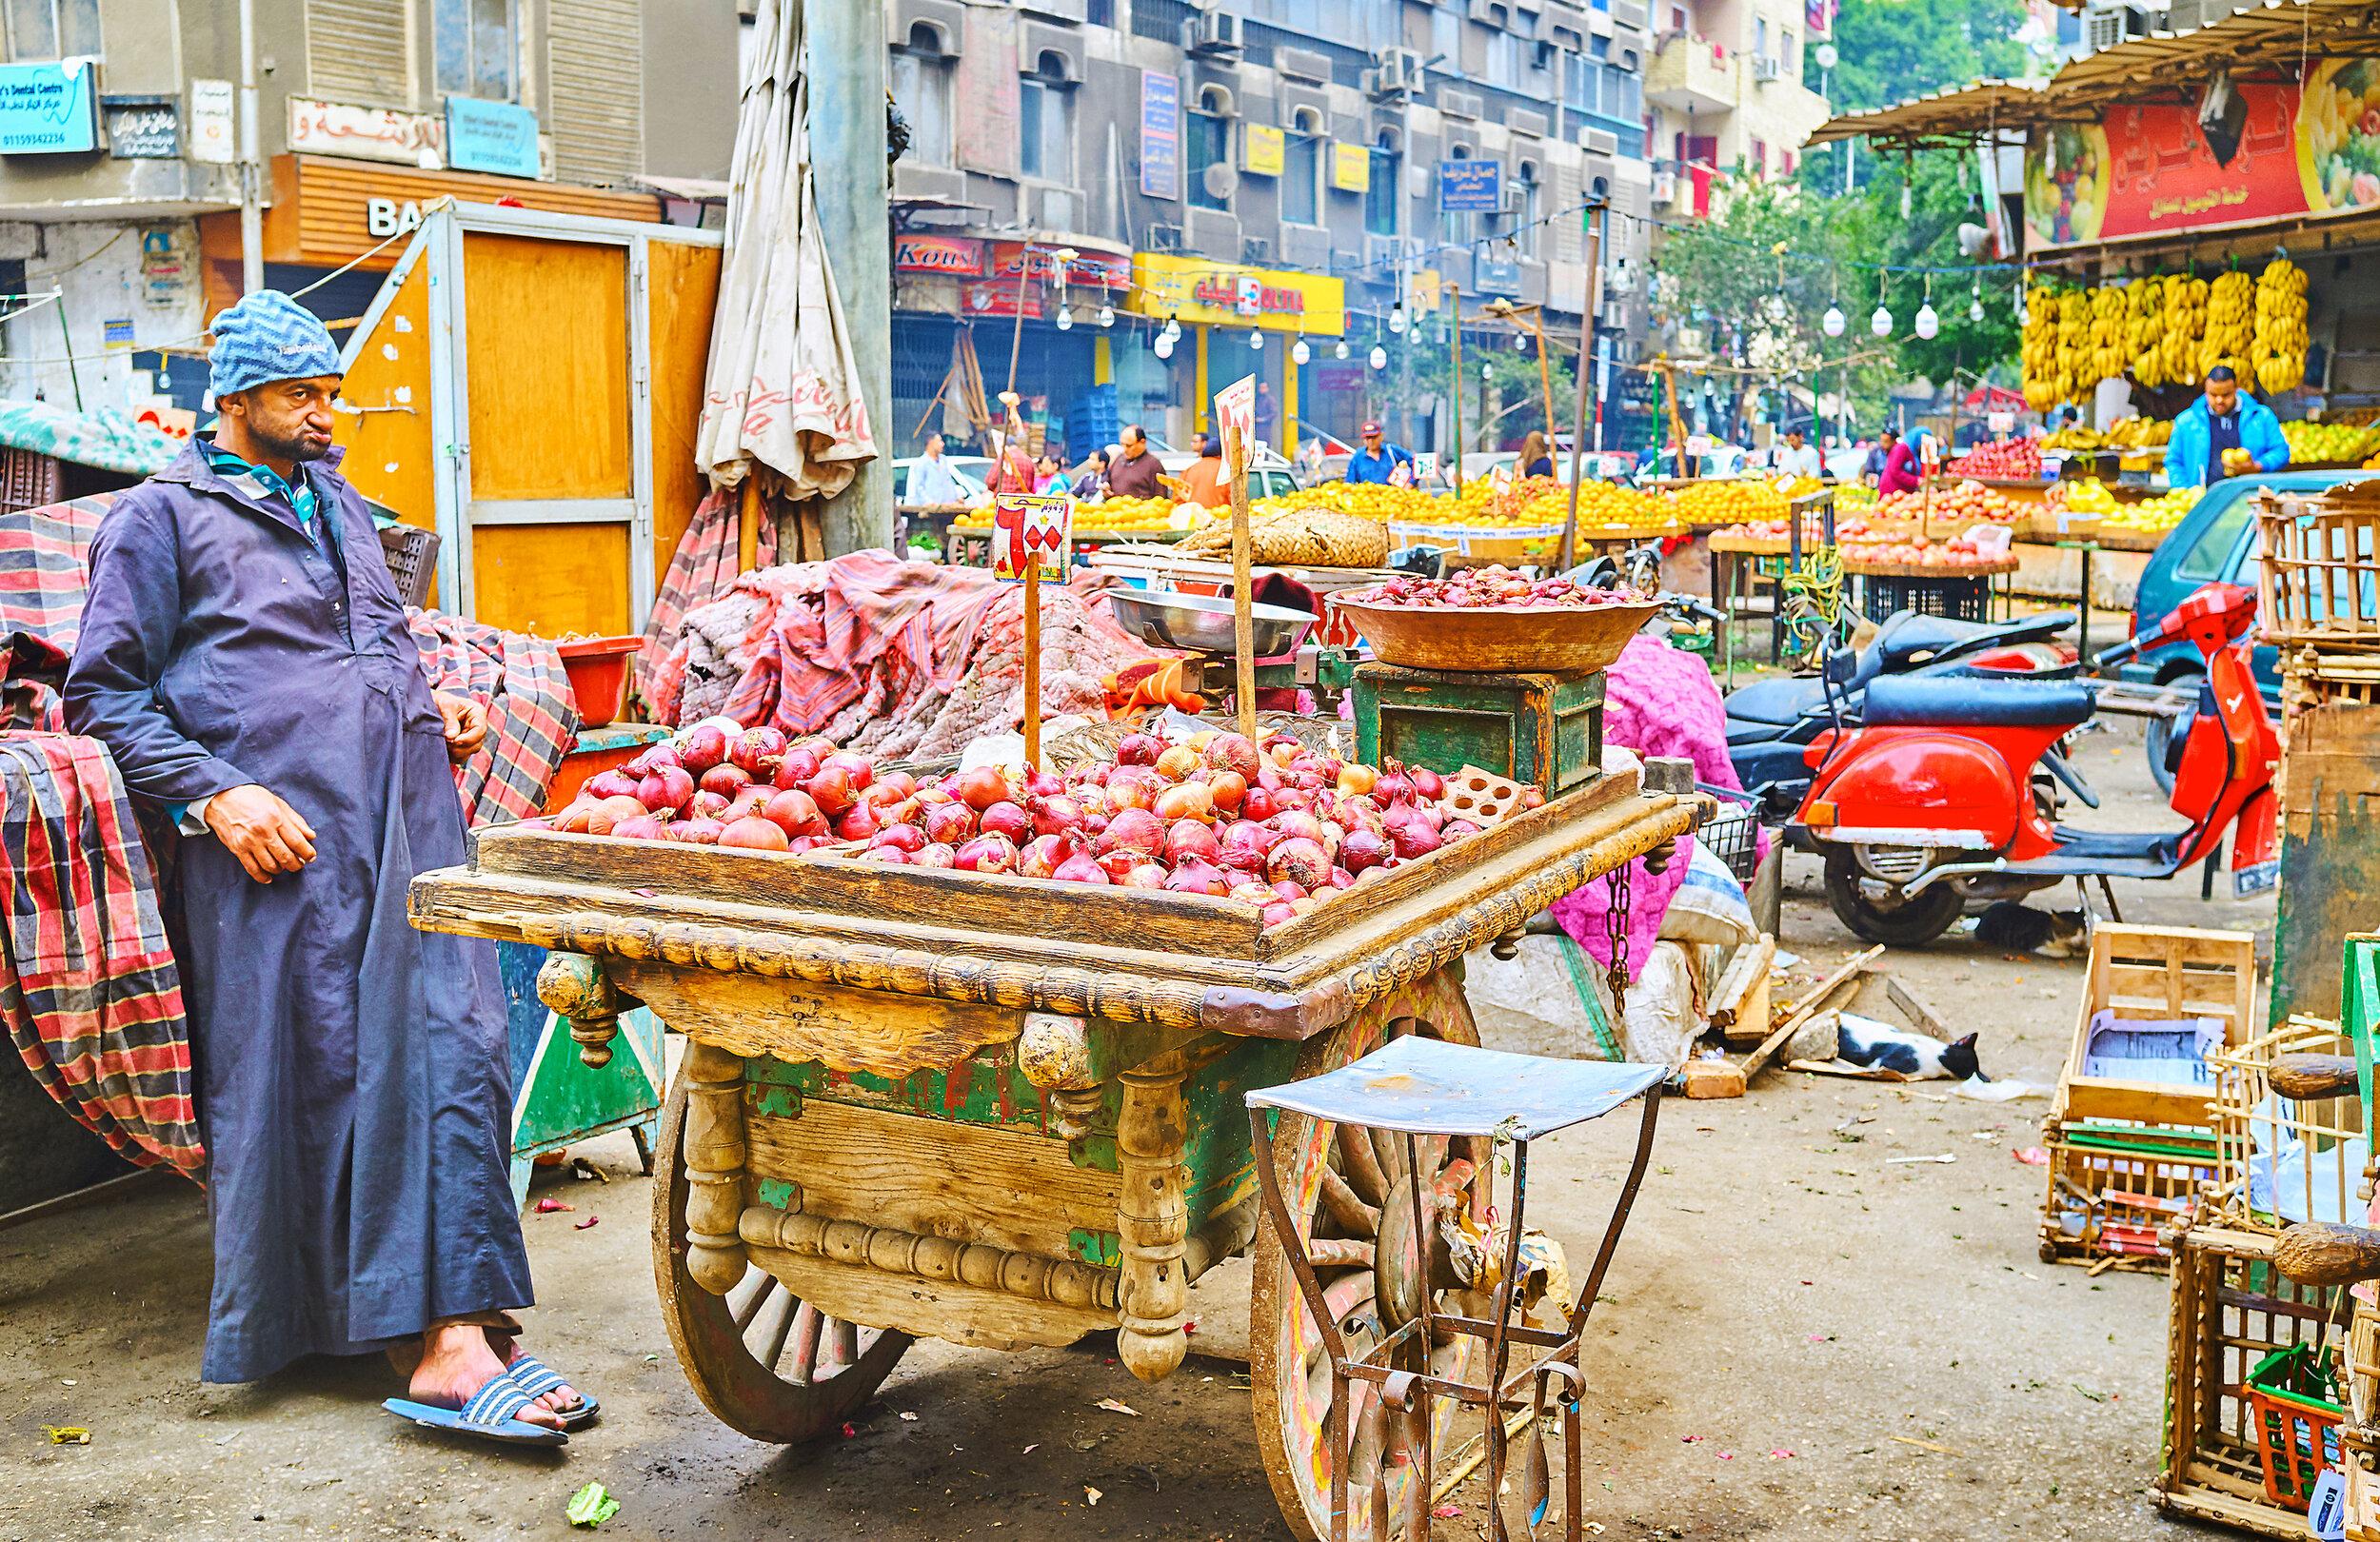 Egyptian street food.